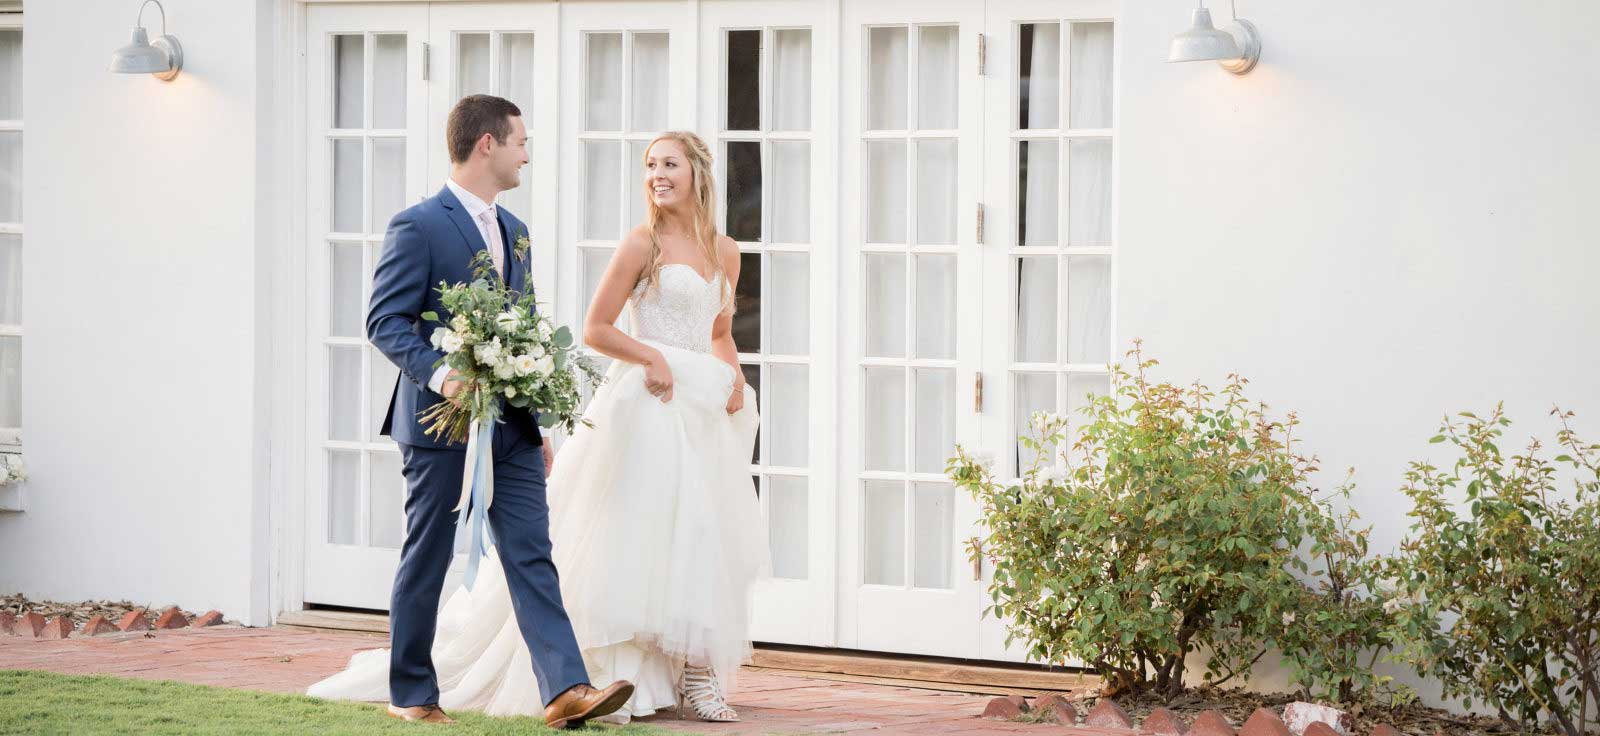 Triunfo Creek Wedding - Hitched Photo 2